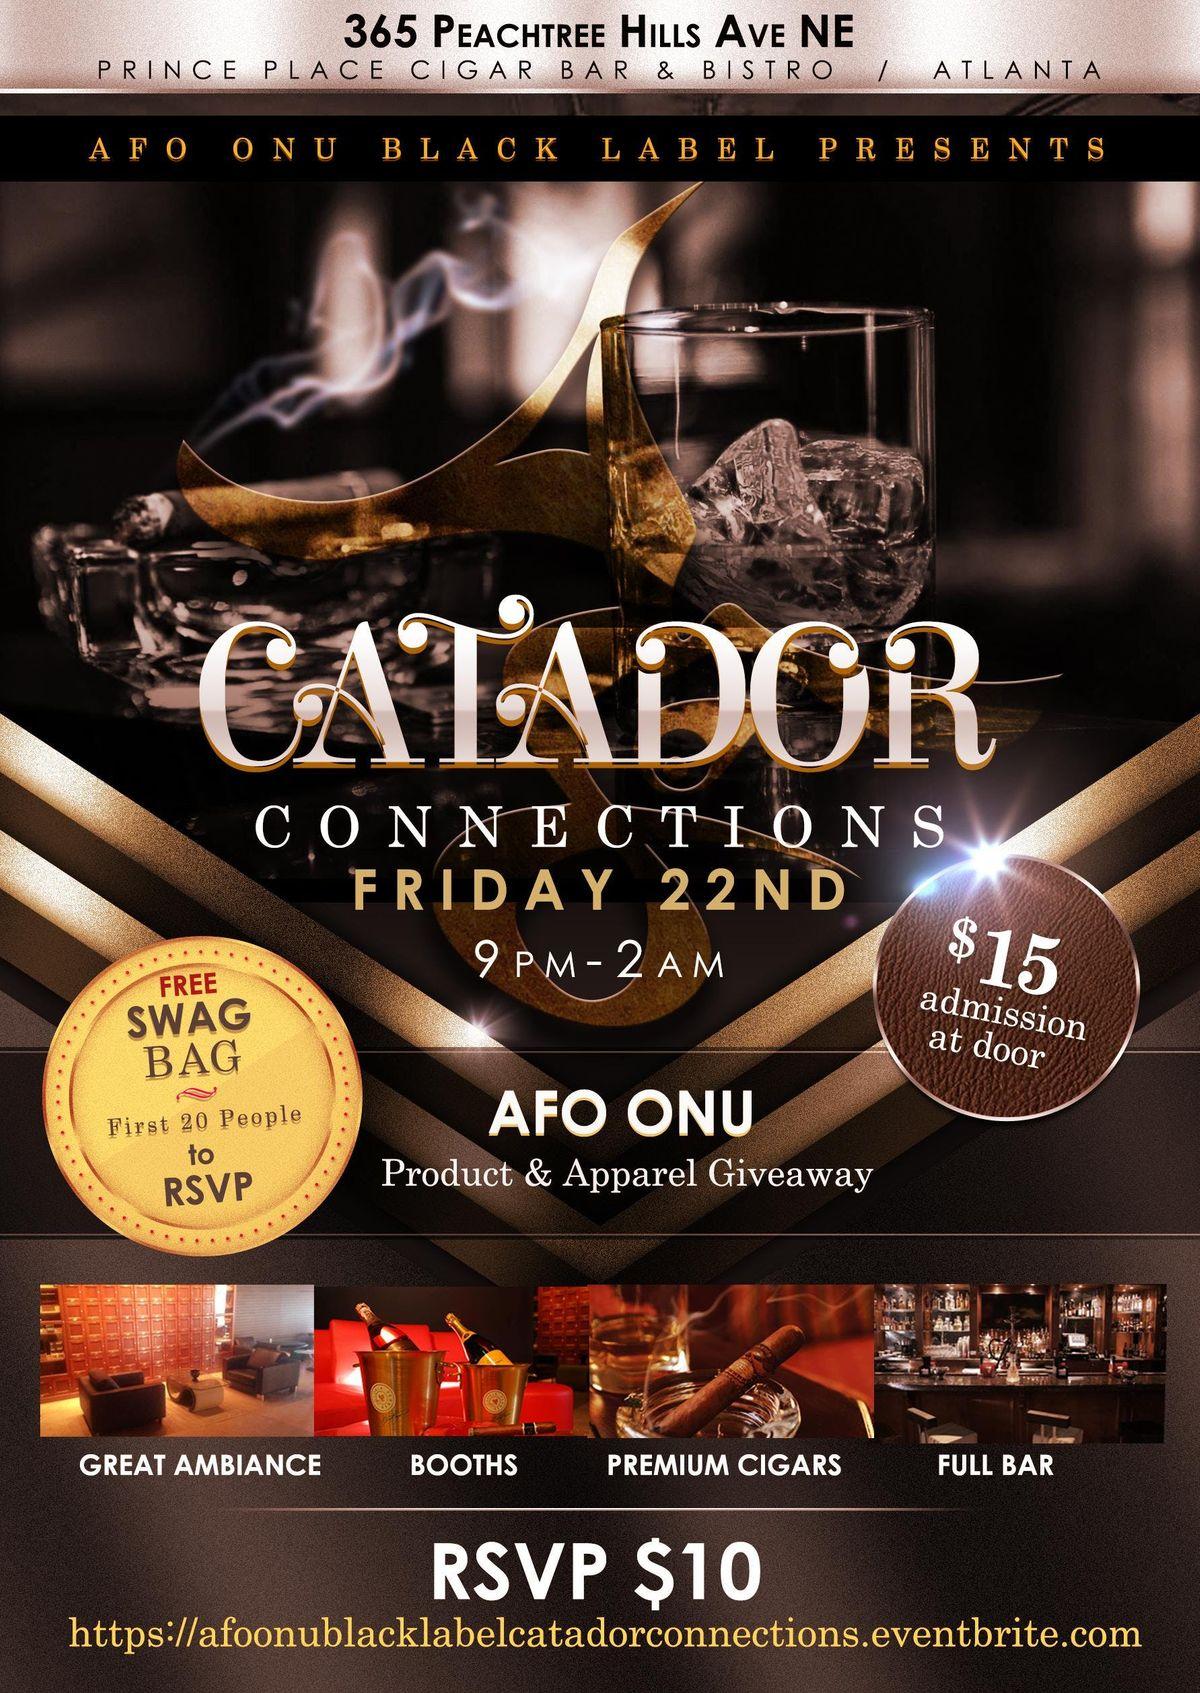 AfOnu(TheBlackLabel)CATADOR CONNECTIONS Social Mixer